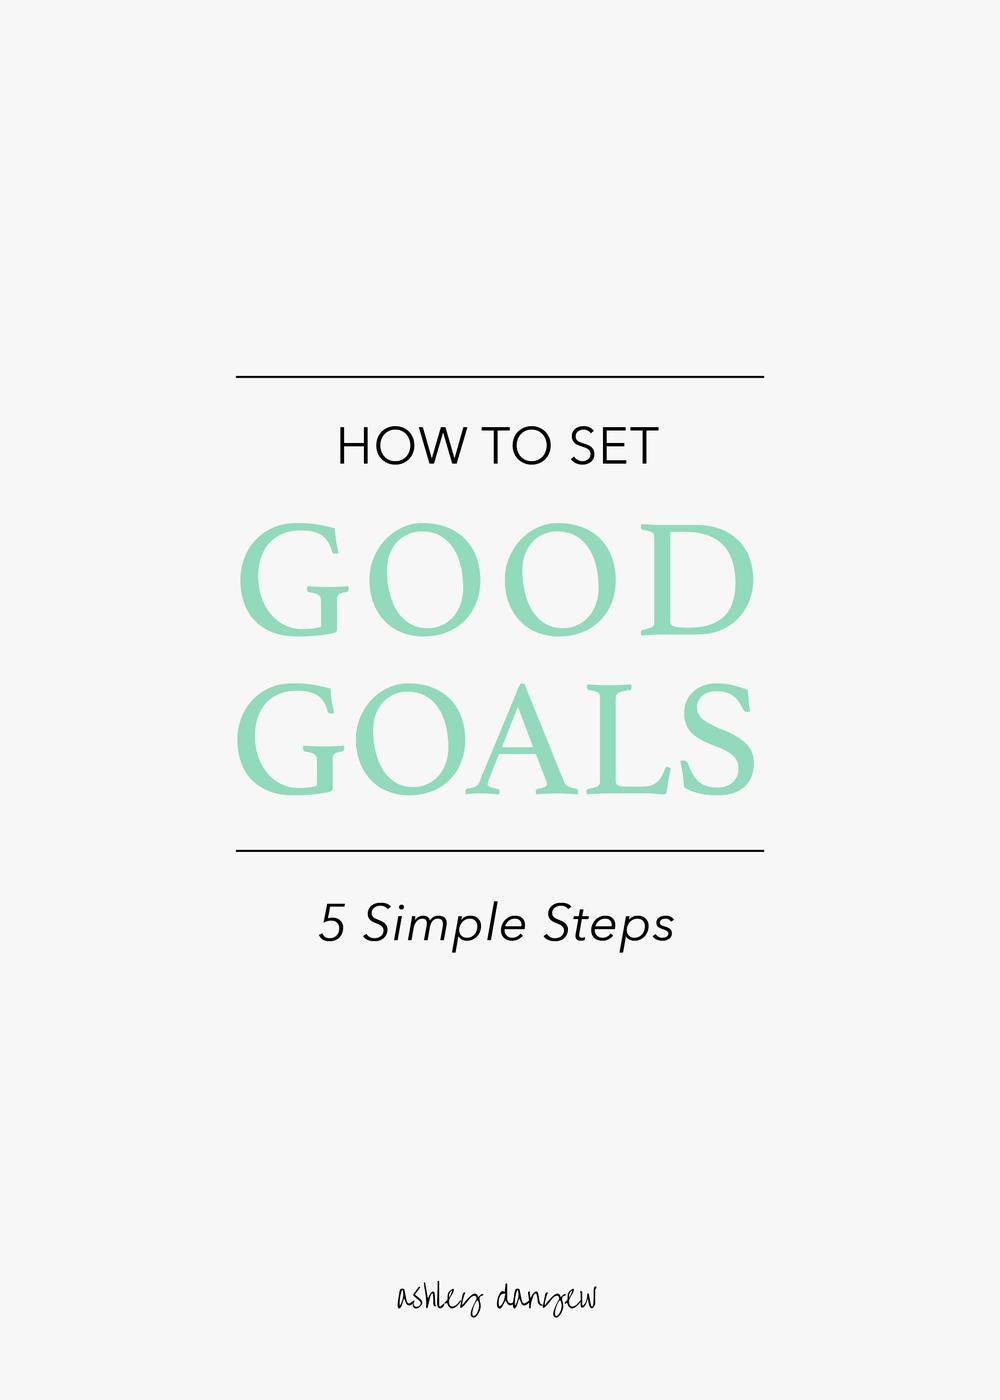 How-to-Set-Good-Goals-01-1.png